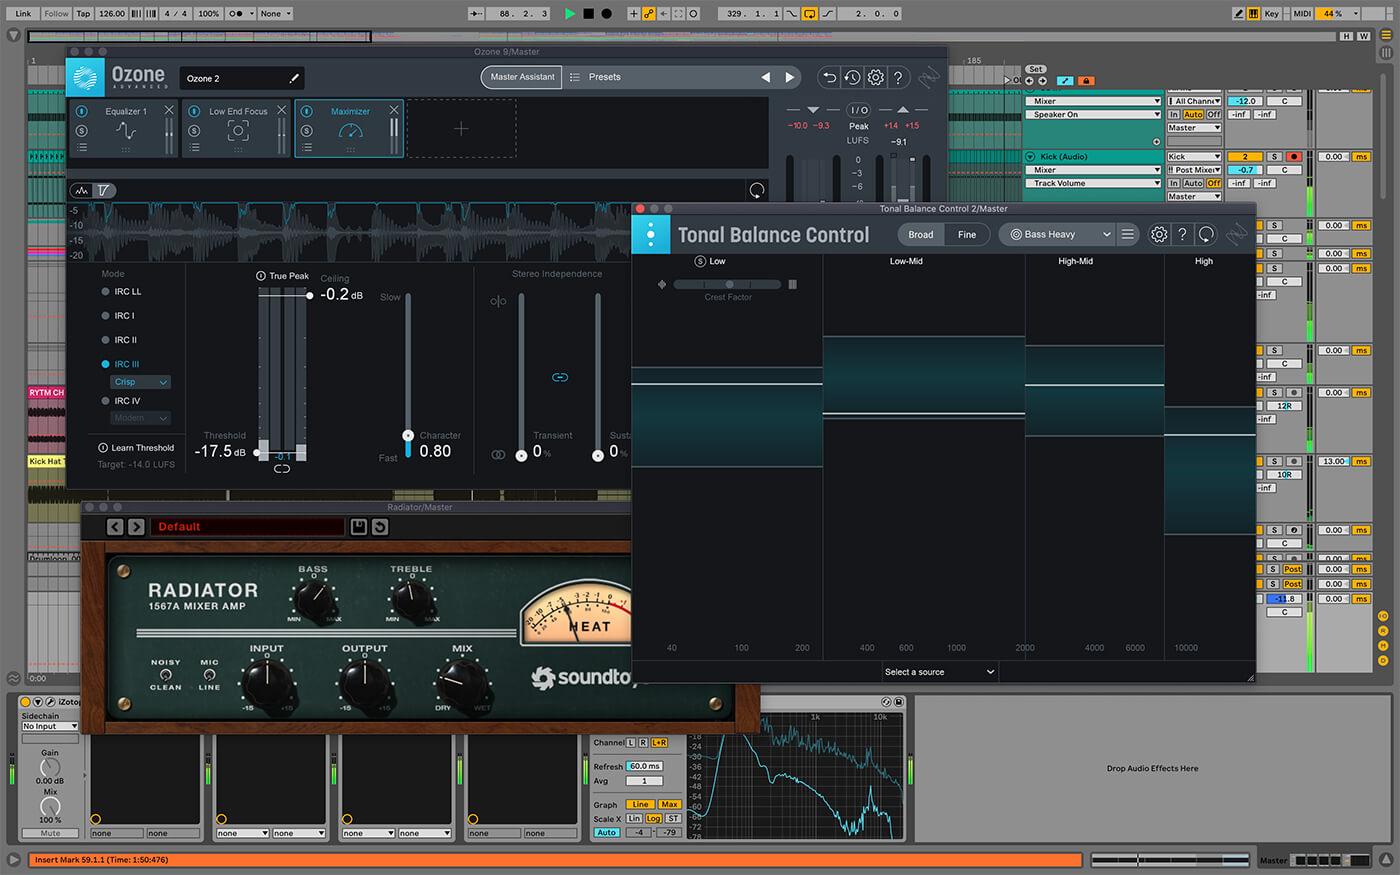 Steve Darko's Plugins - Mastering Chain